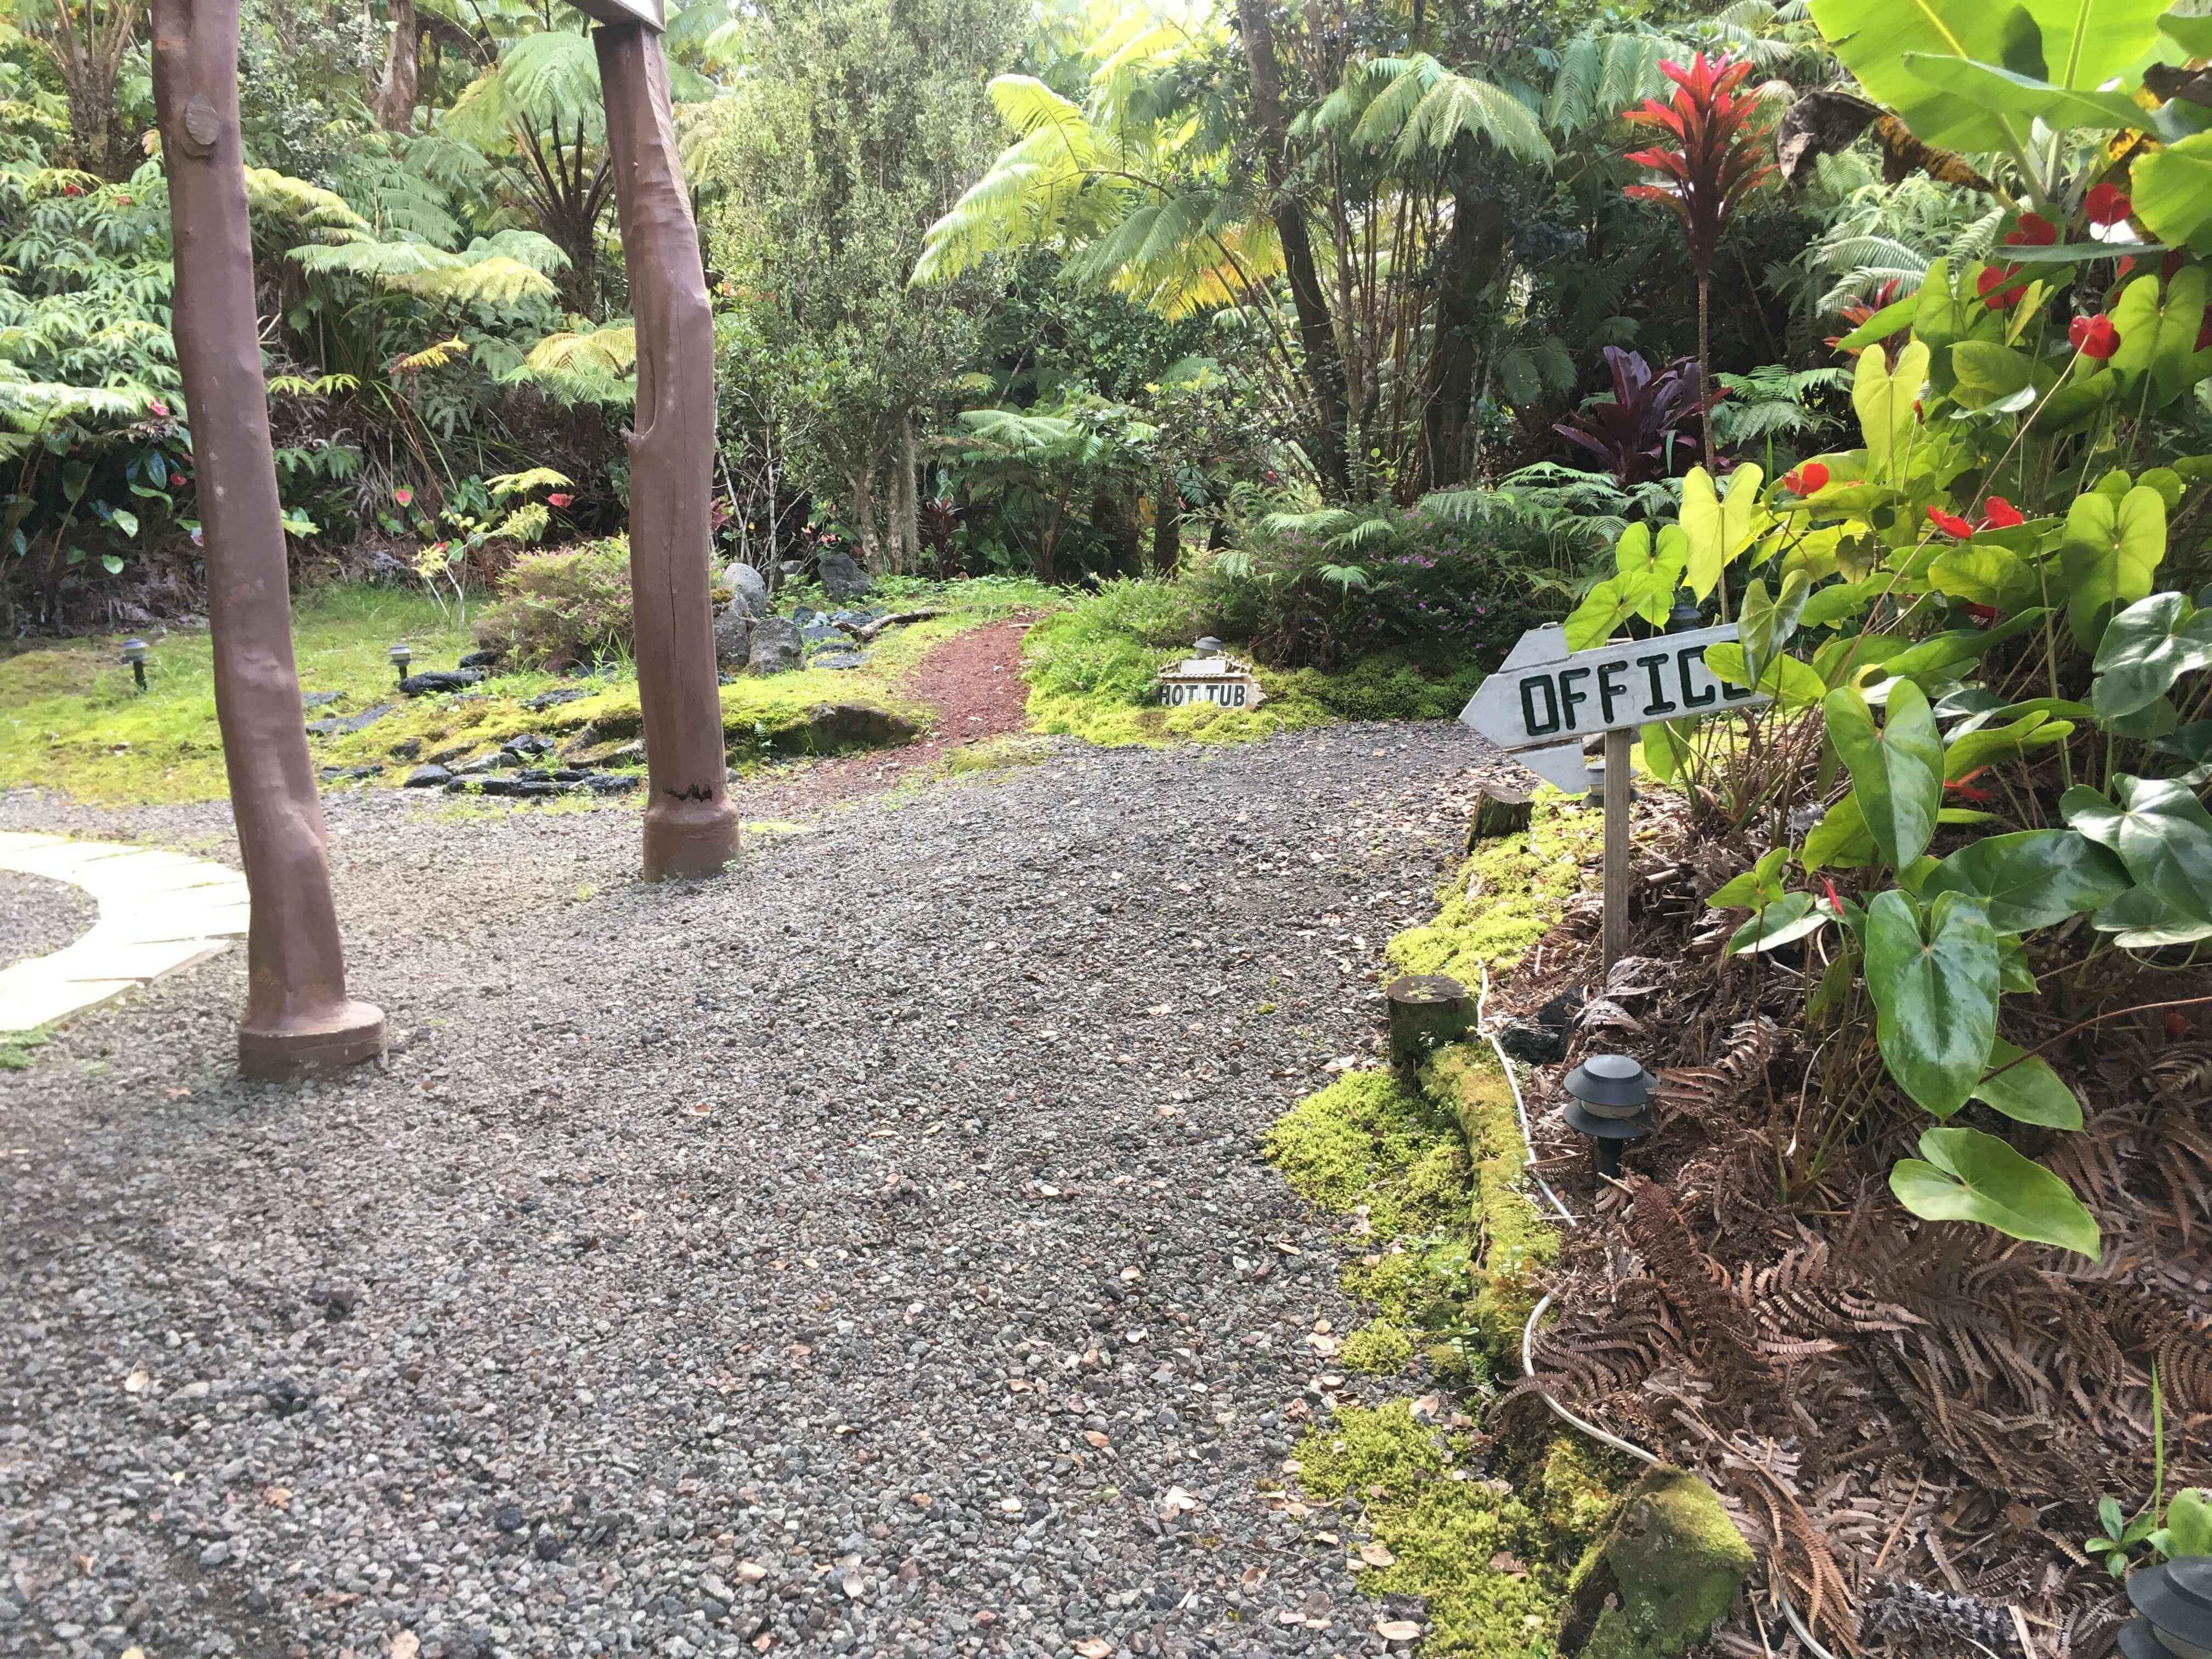 volcano hotel - volcano inn - office path